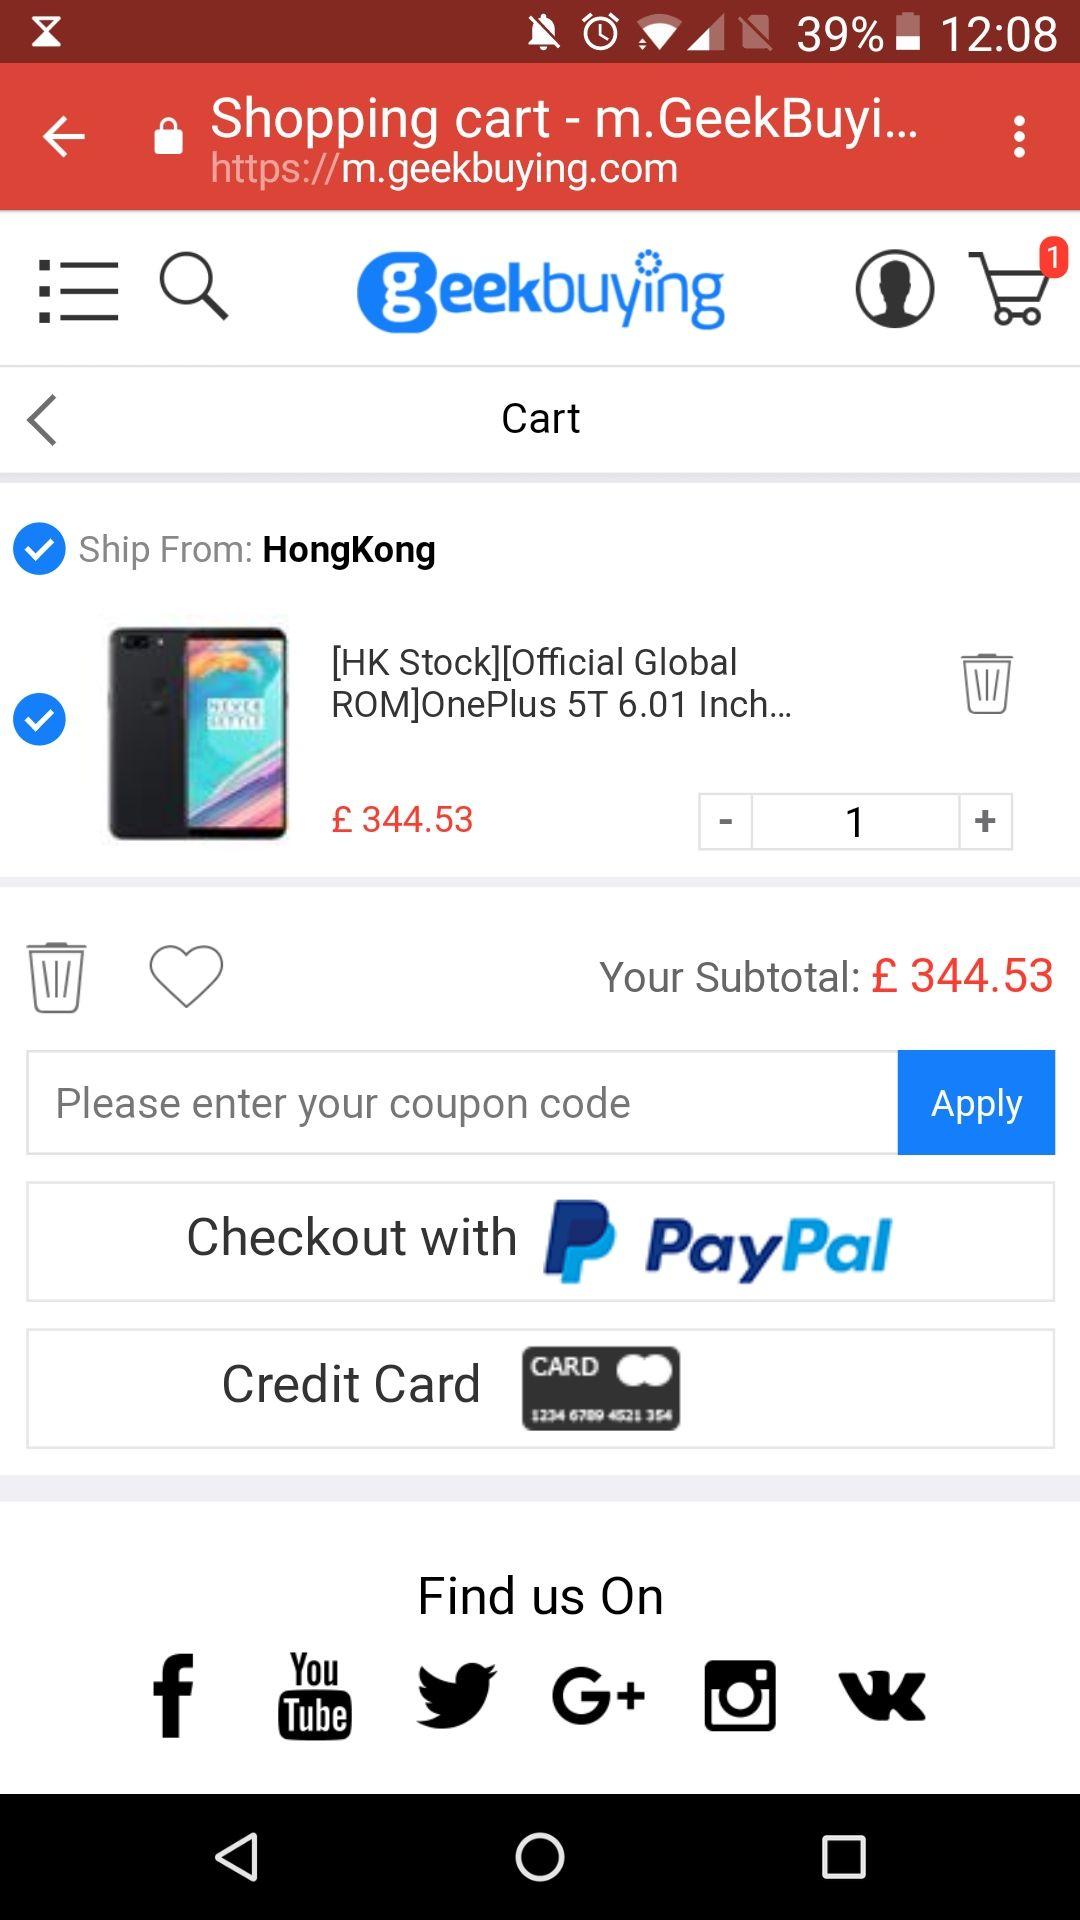 OnePlus 5T 6.01 Inch Smartphone  £352.02 @ Geekbuying (HK Warehouse)